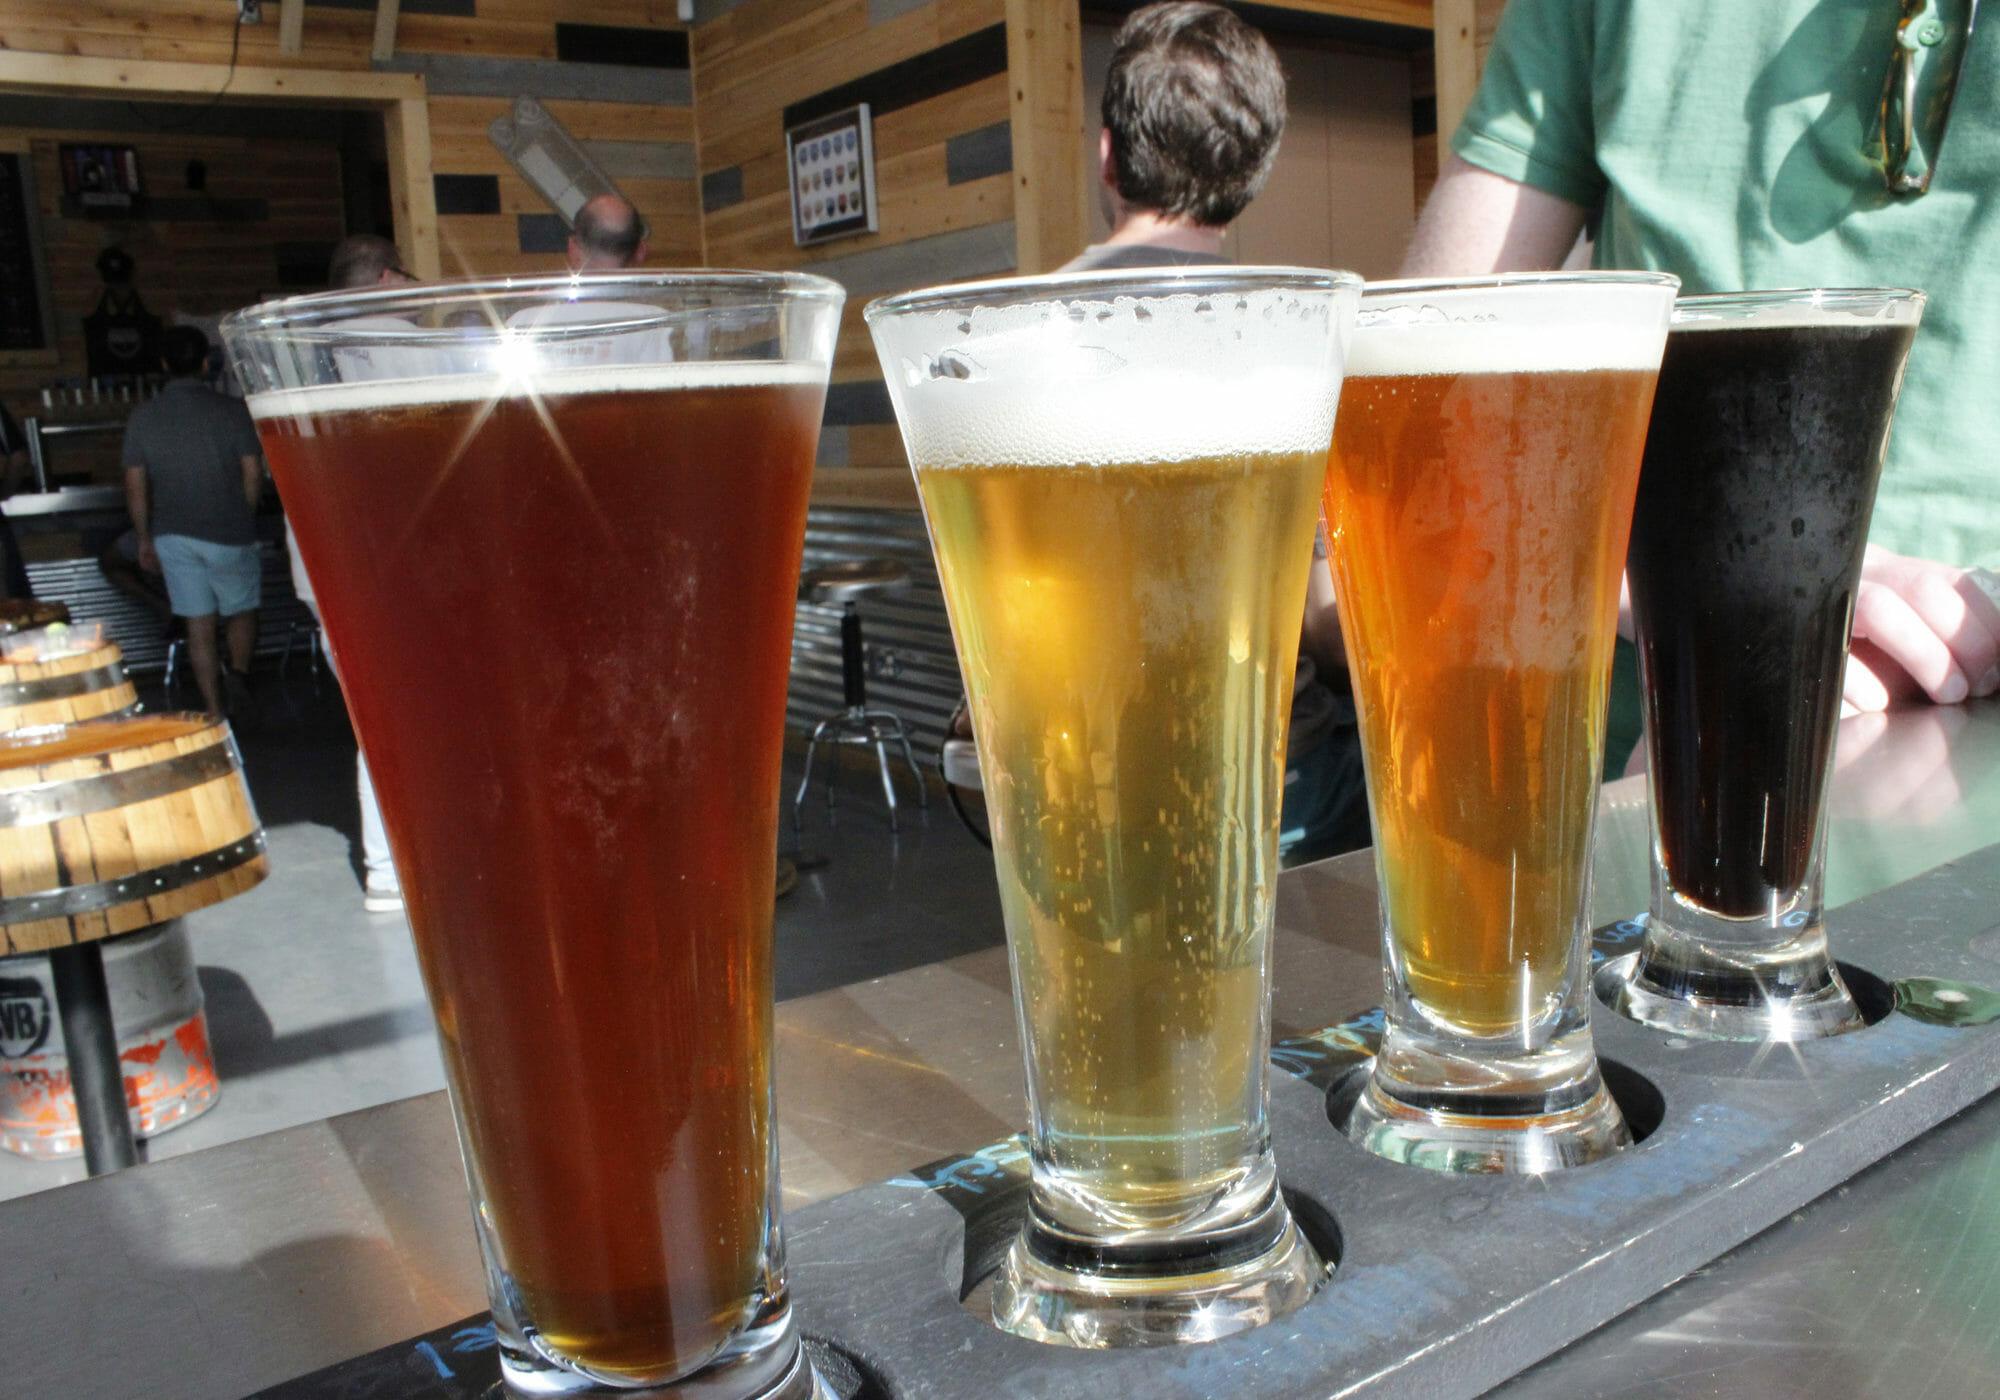 Flight of beer at Coachella Valley Brewing Co.